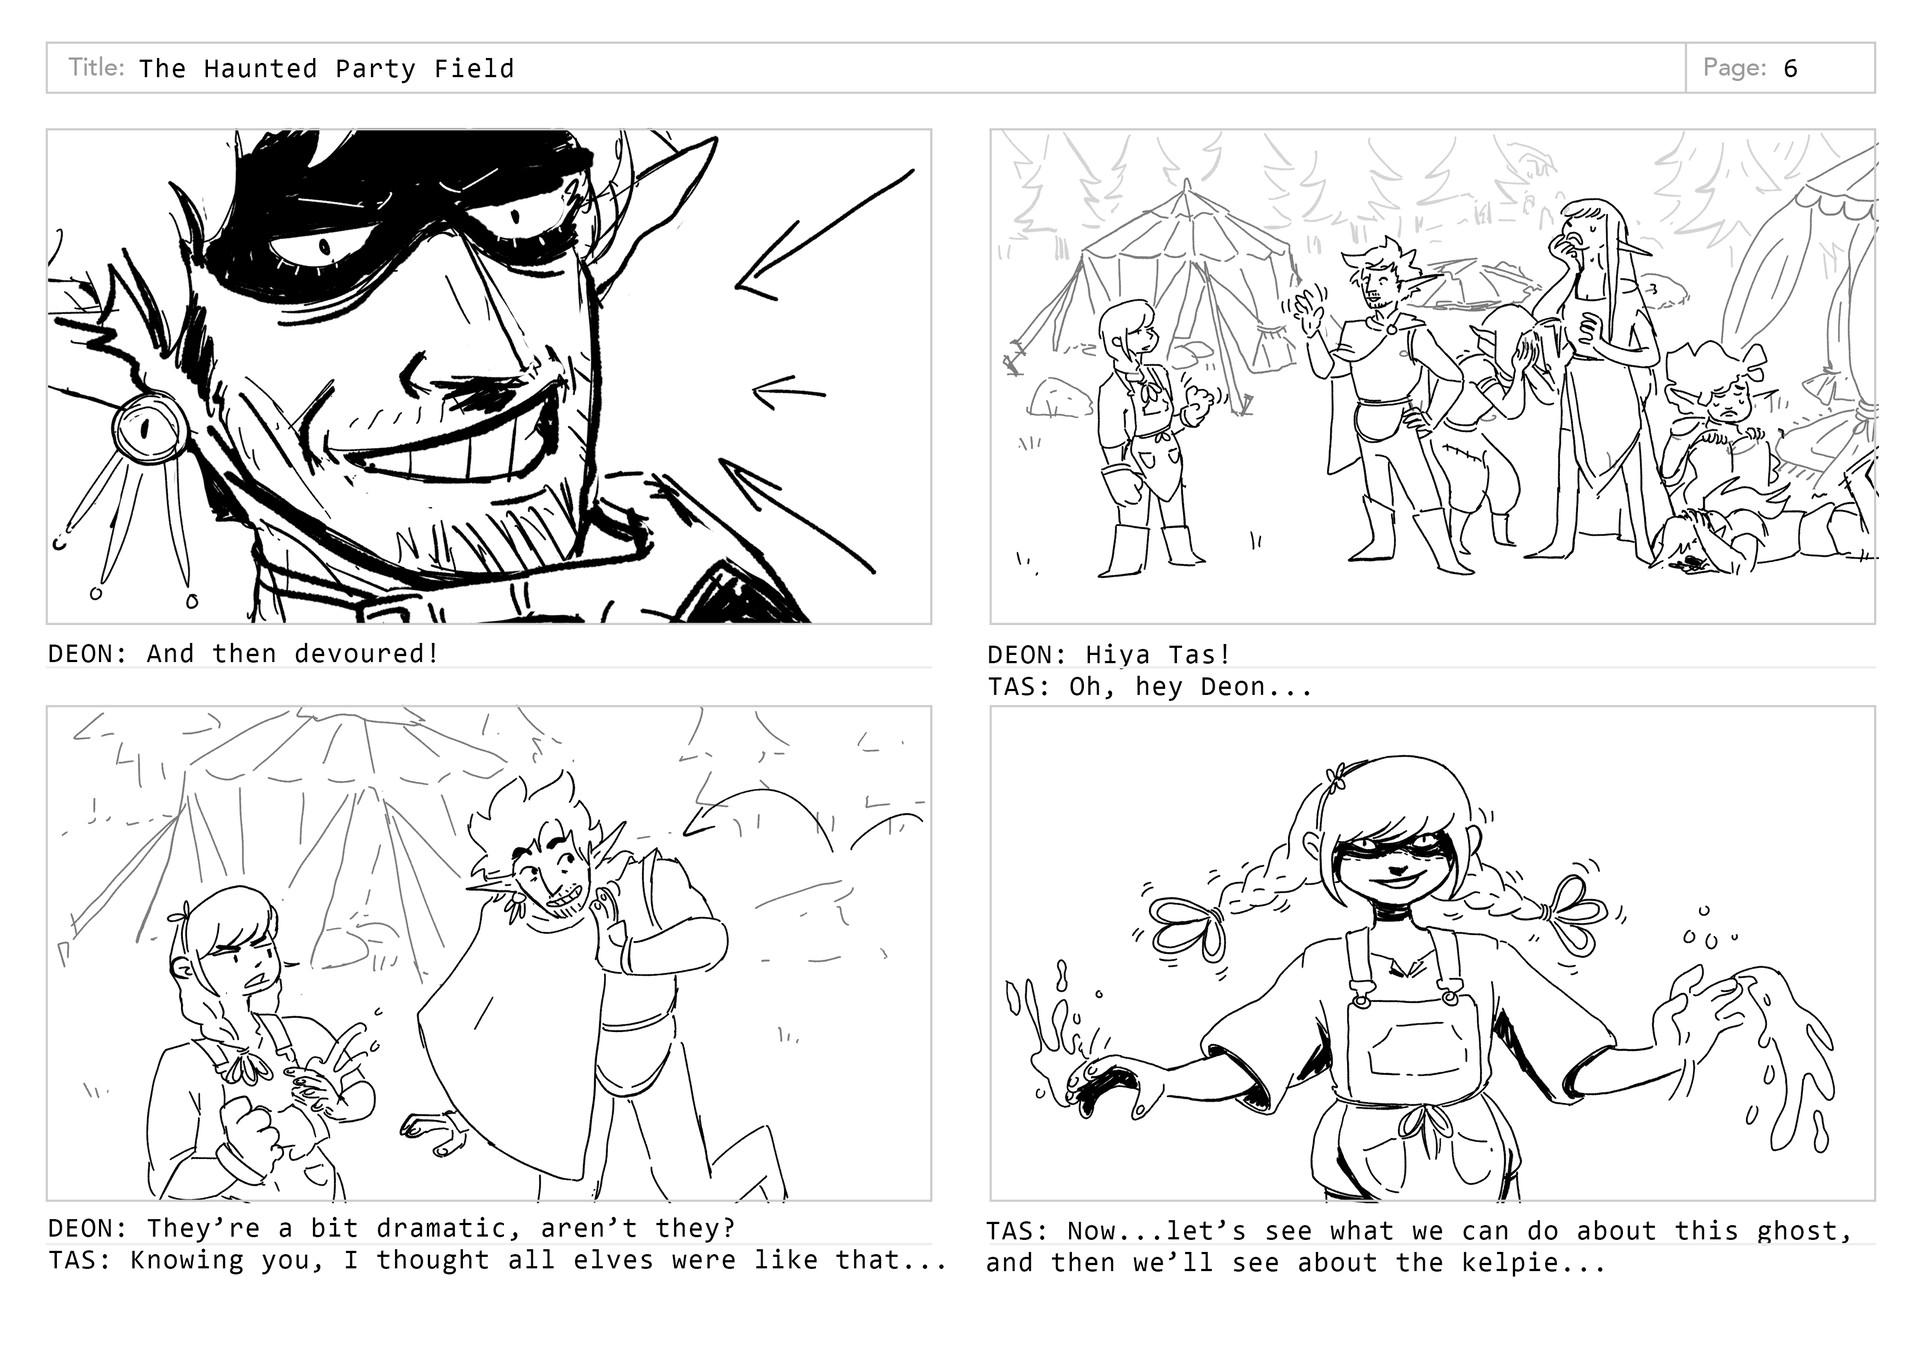 Erin hoover storyboard 6